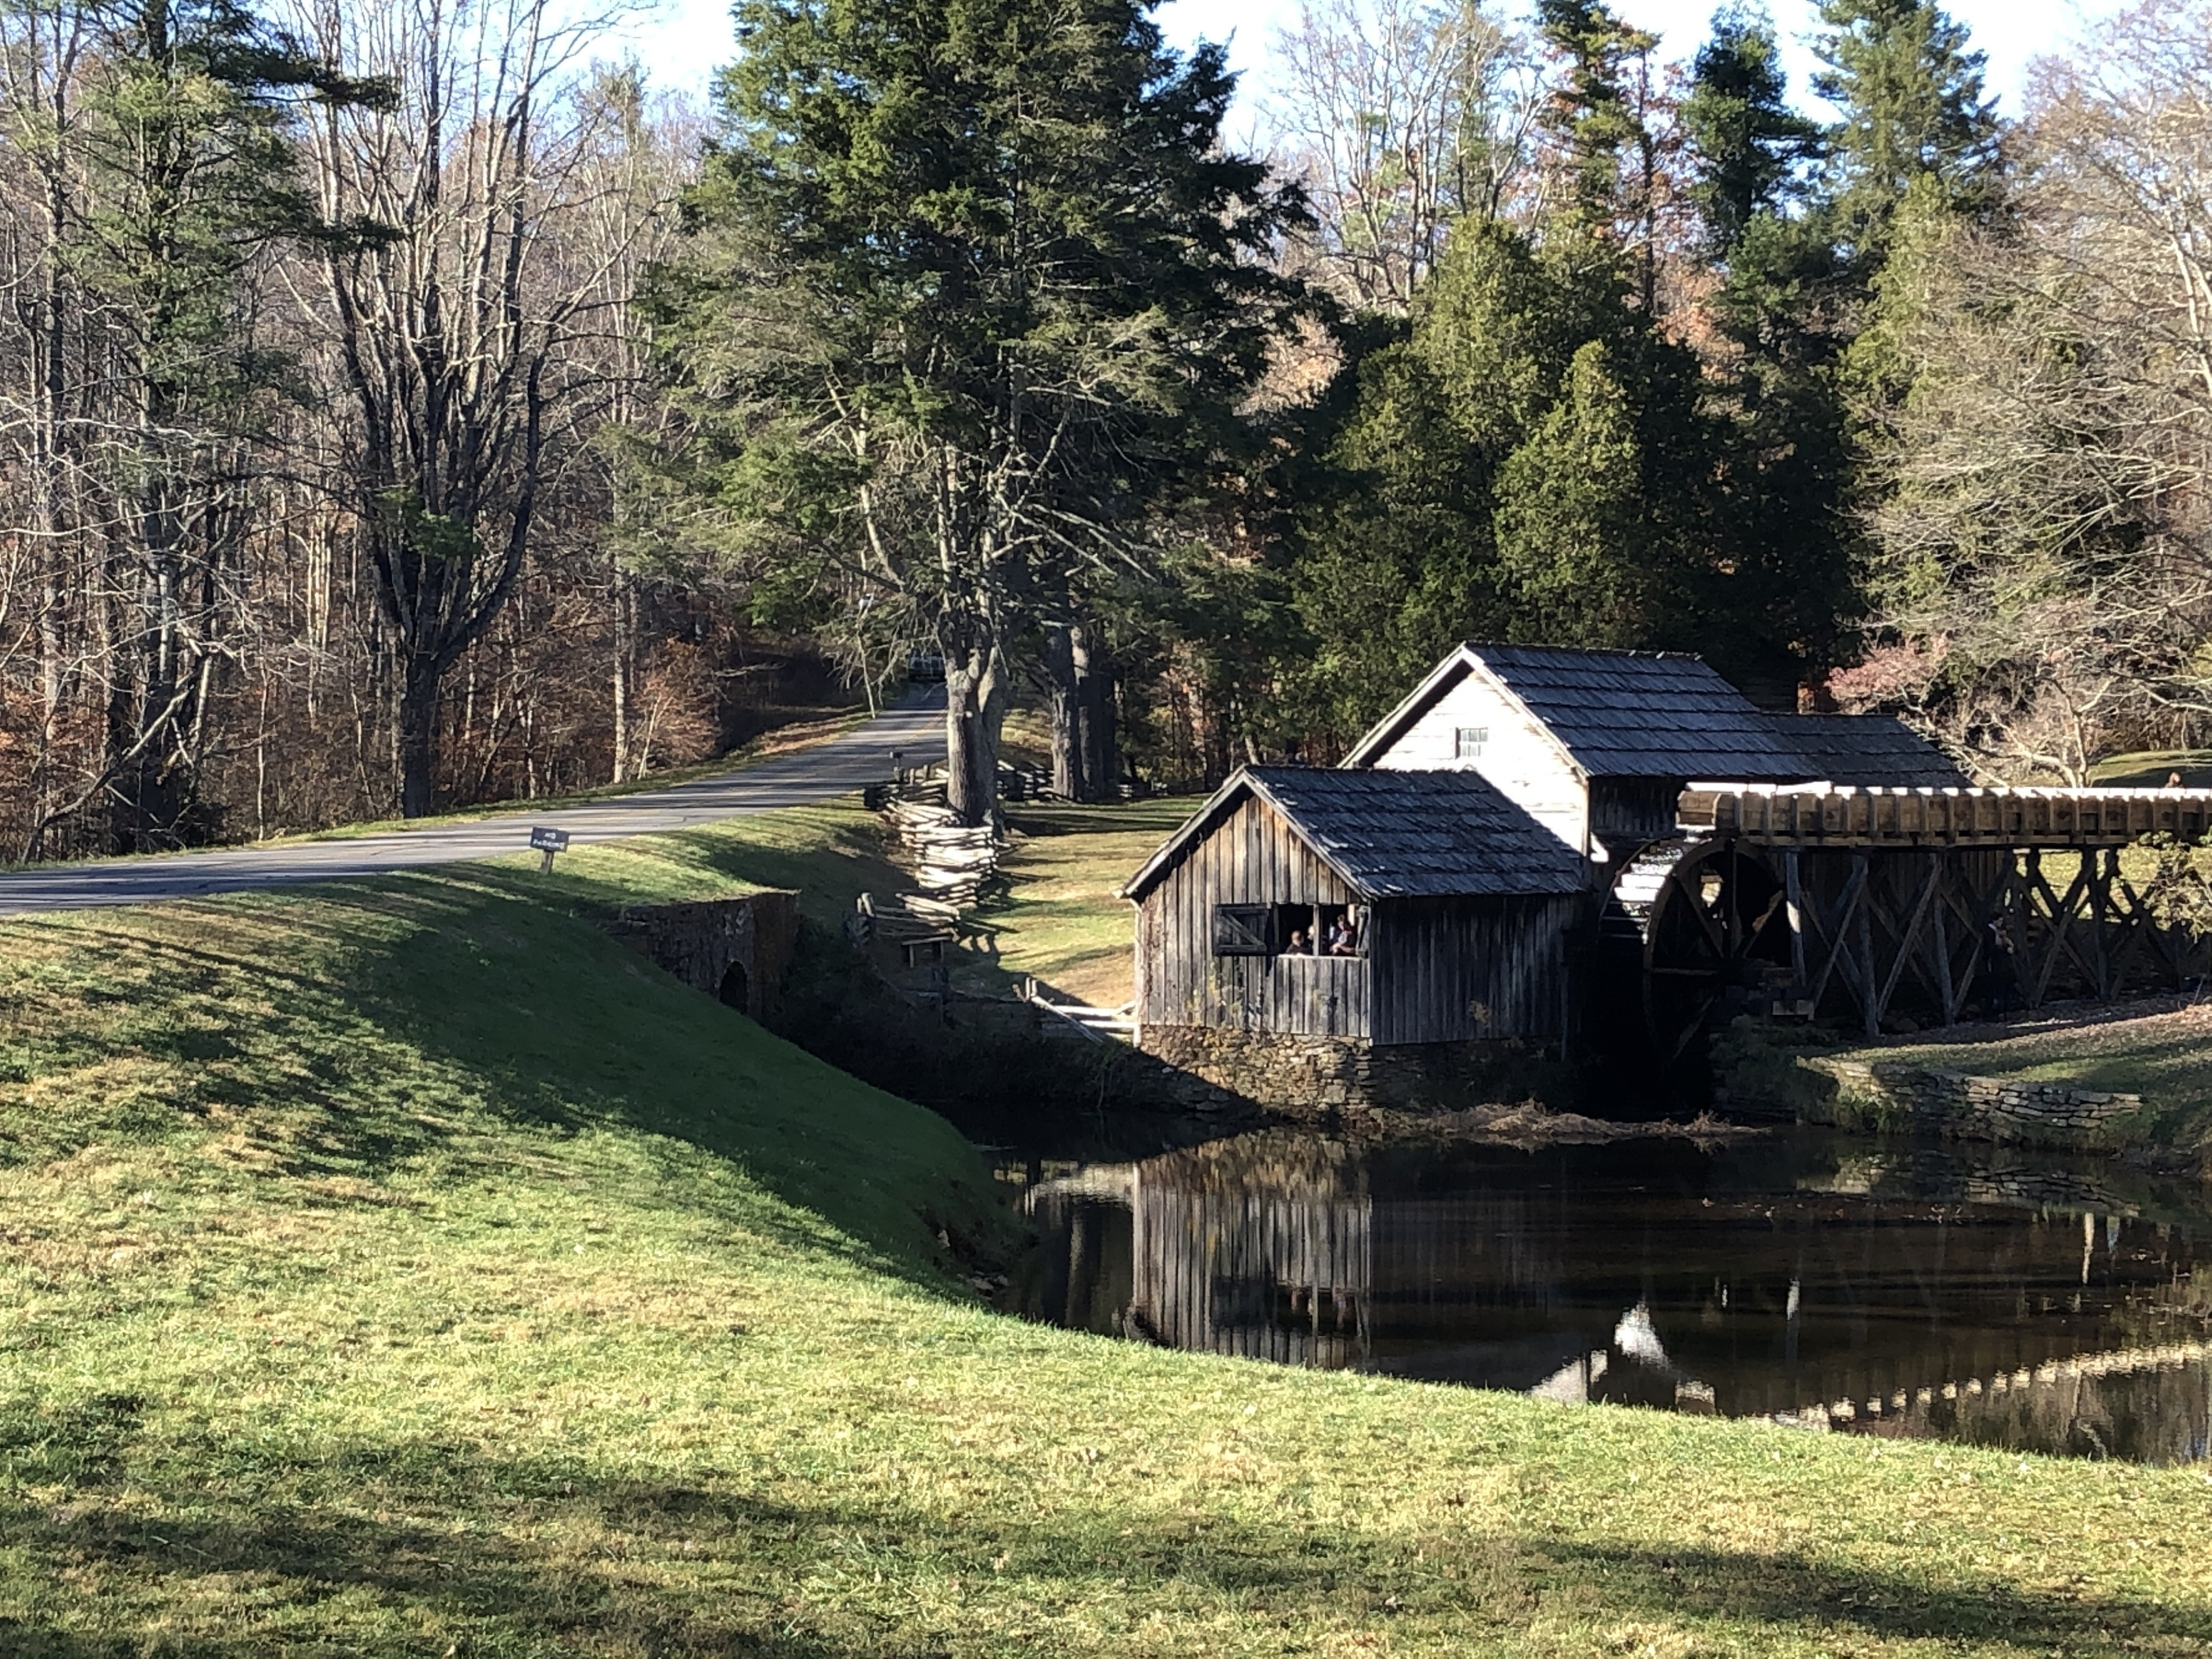 Floyd County, Virginia, United States of America